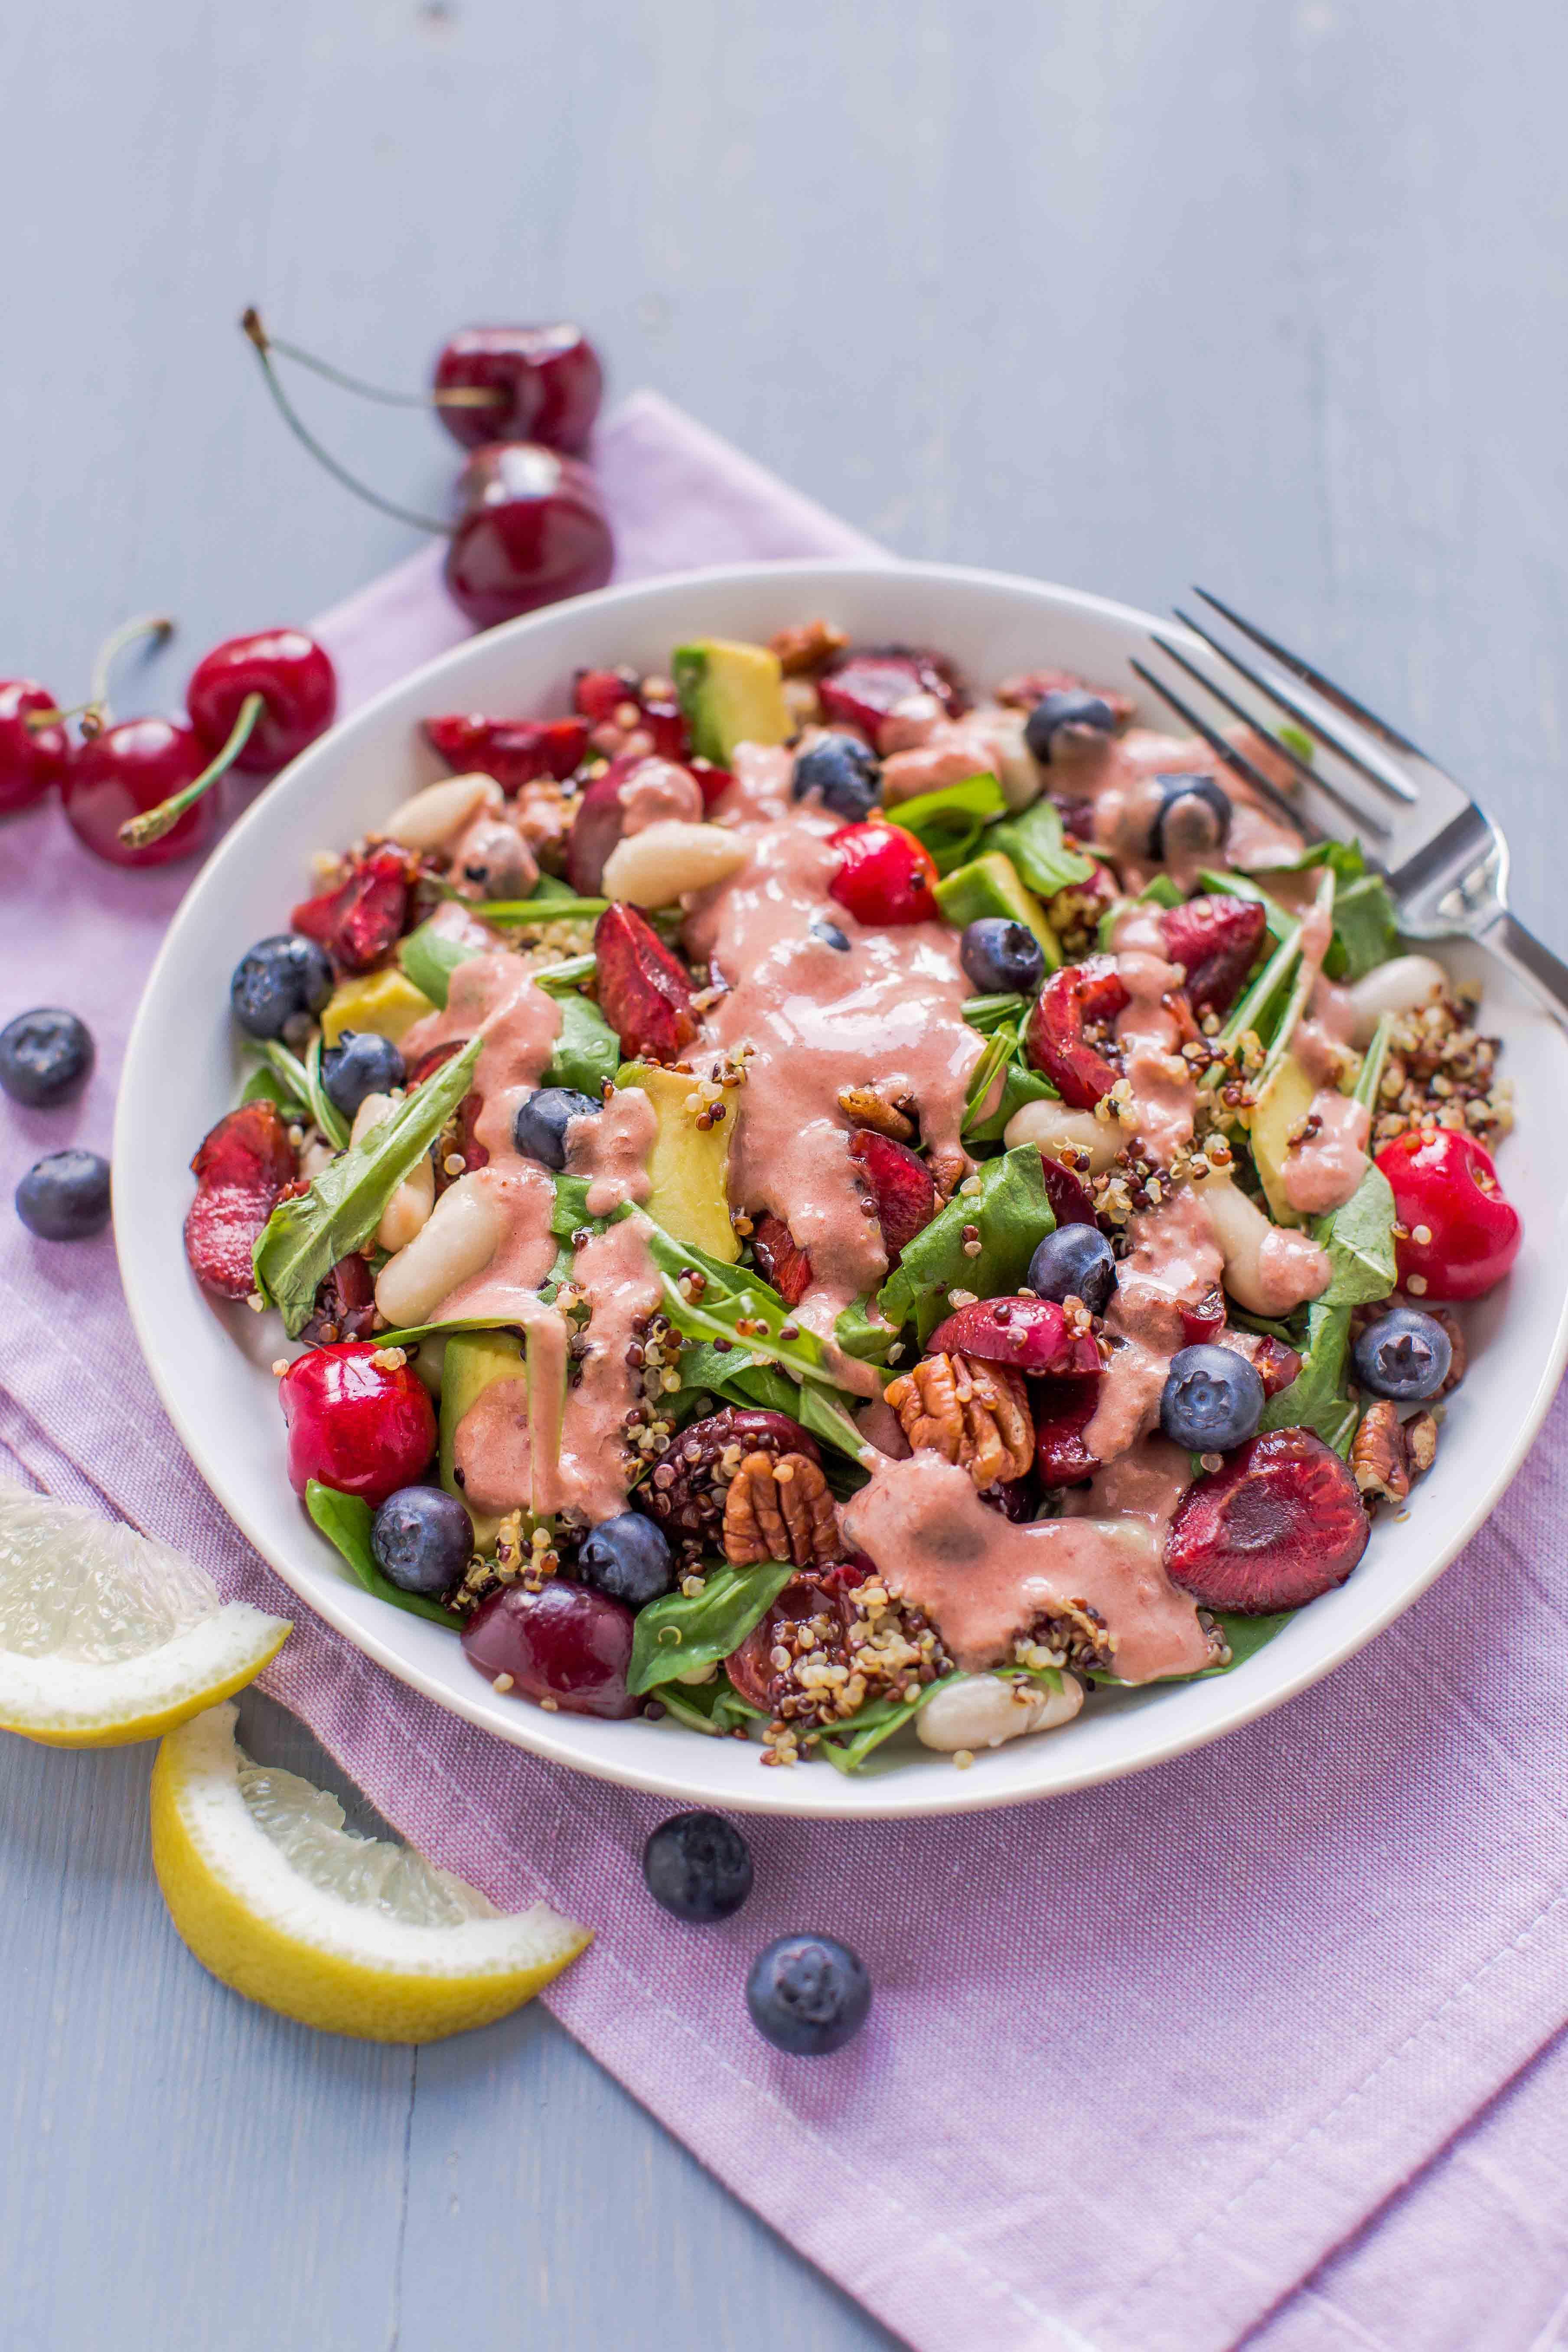 insalata di quinoa e ciliegie all'aceto balsamico e mirtilli - balsamic cherry quinoa salad + cherry vinaigrette #vegan #glutenfree